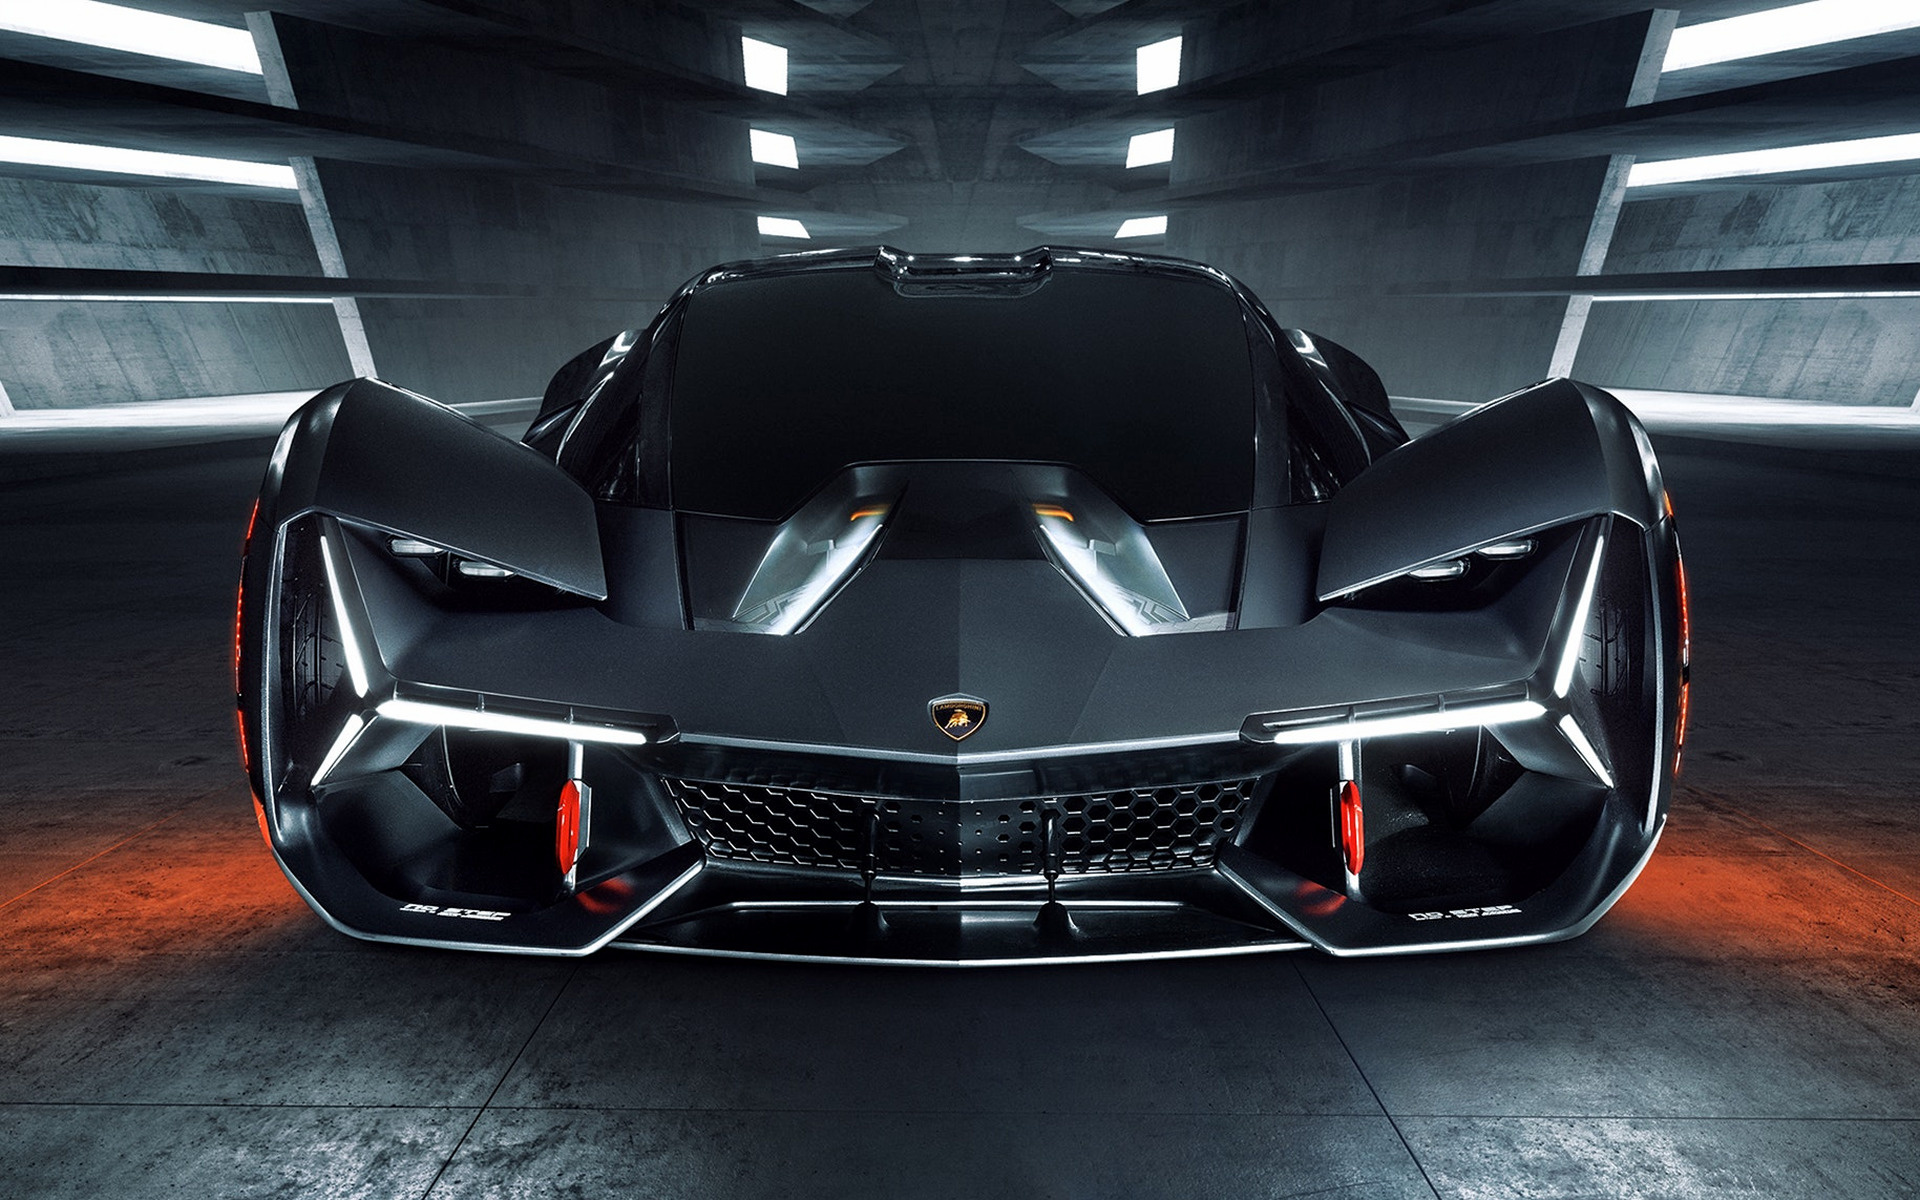 2017 Lamborghini Terzo Millennio Wallpapers And Hd Images Car Pixel